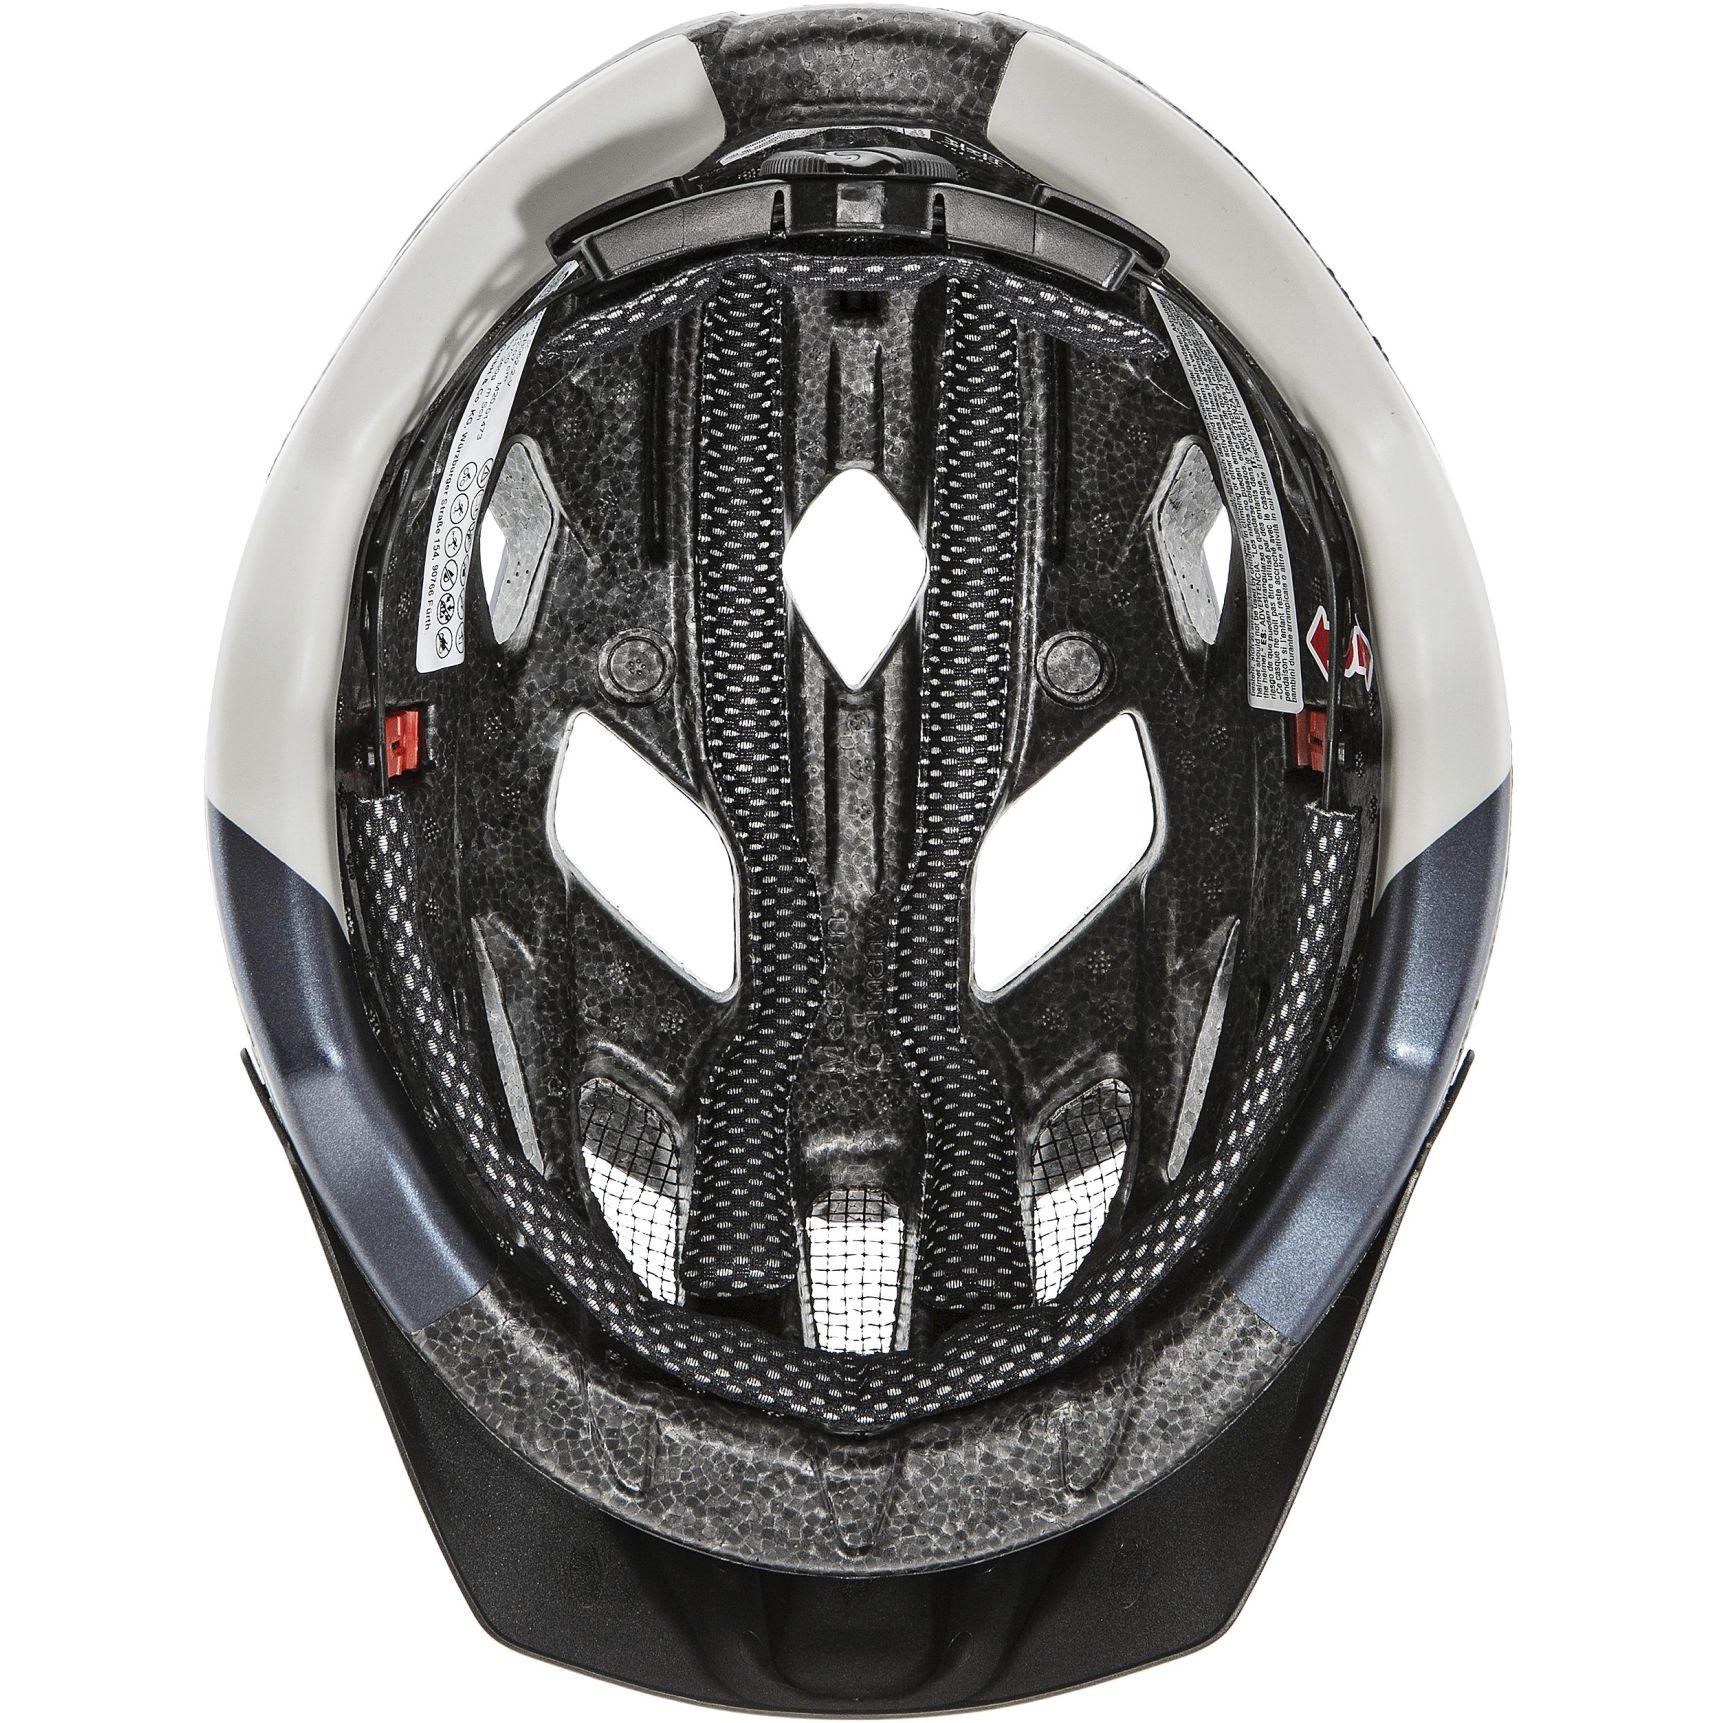 Image of Uvex active cc Helmet - deep space sand mat